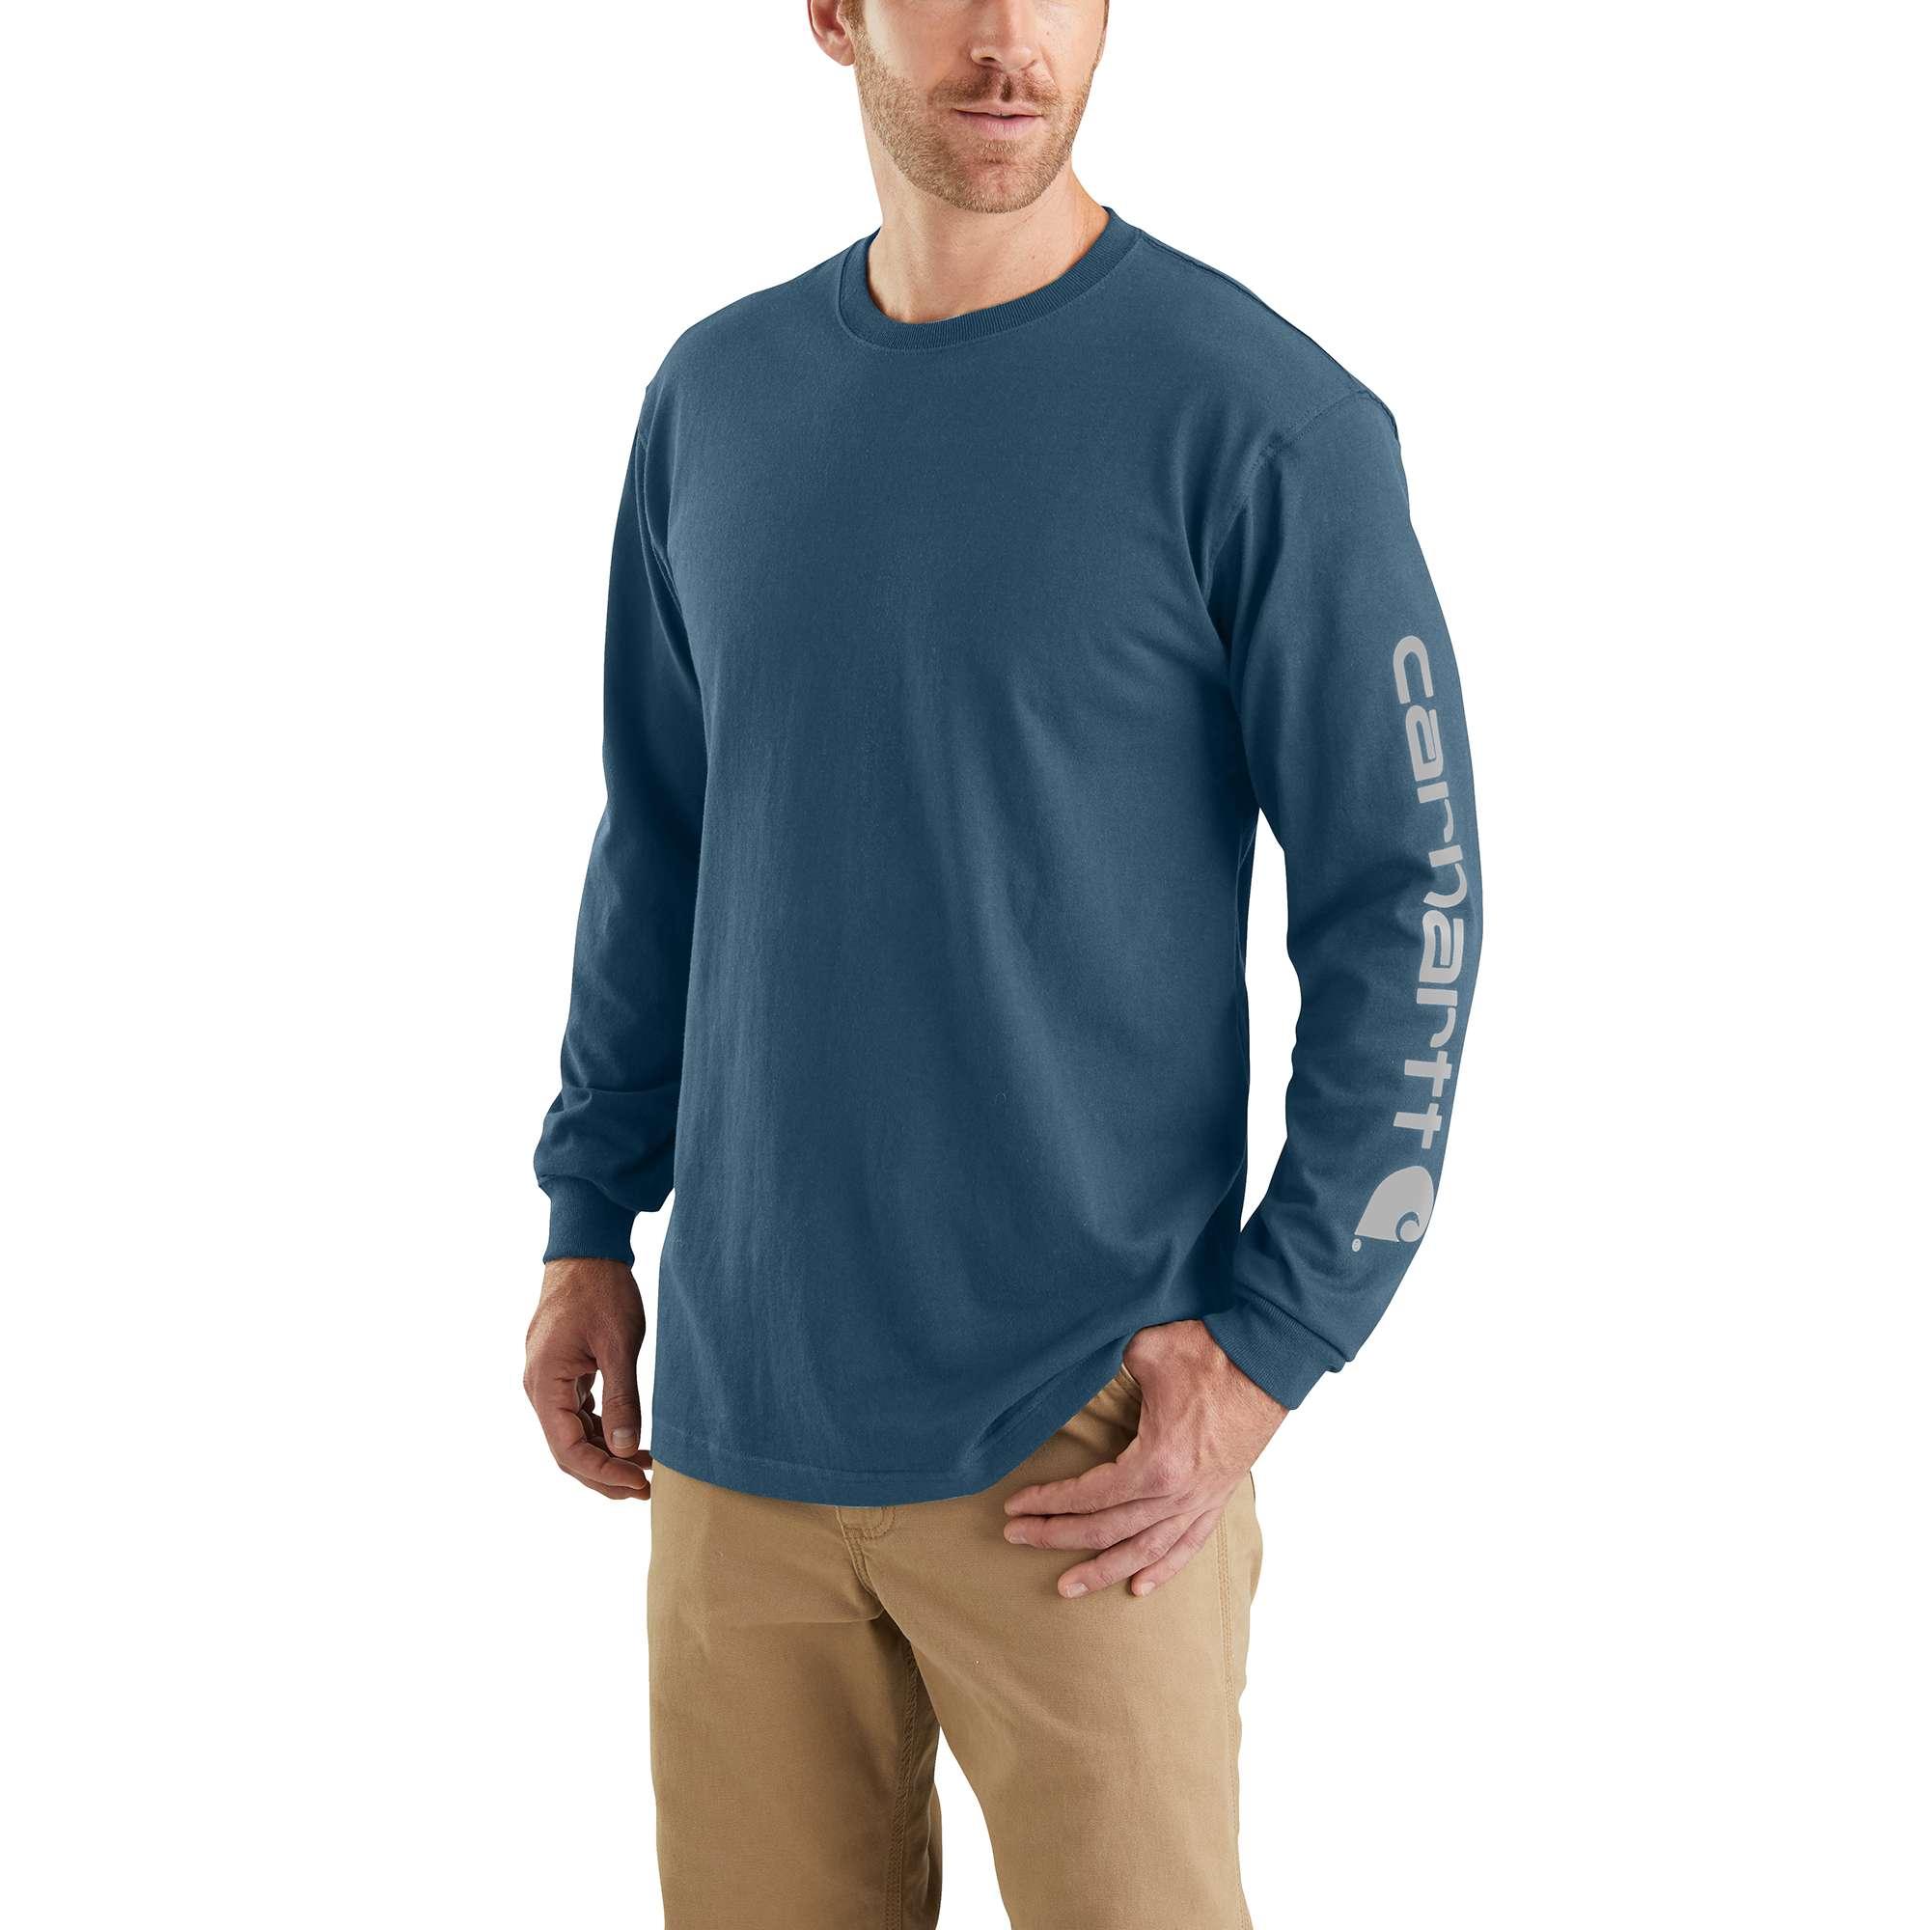 Men's Big & Tall Signature-Sleeve Logo Long-Sleeve T-Shirt, Blue, swatch